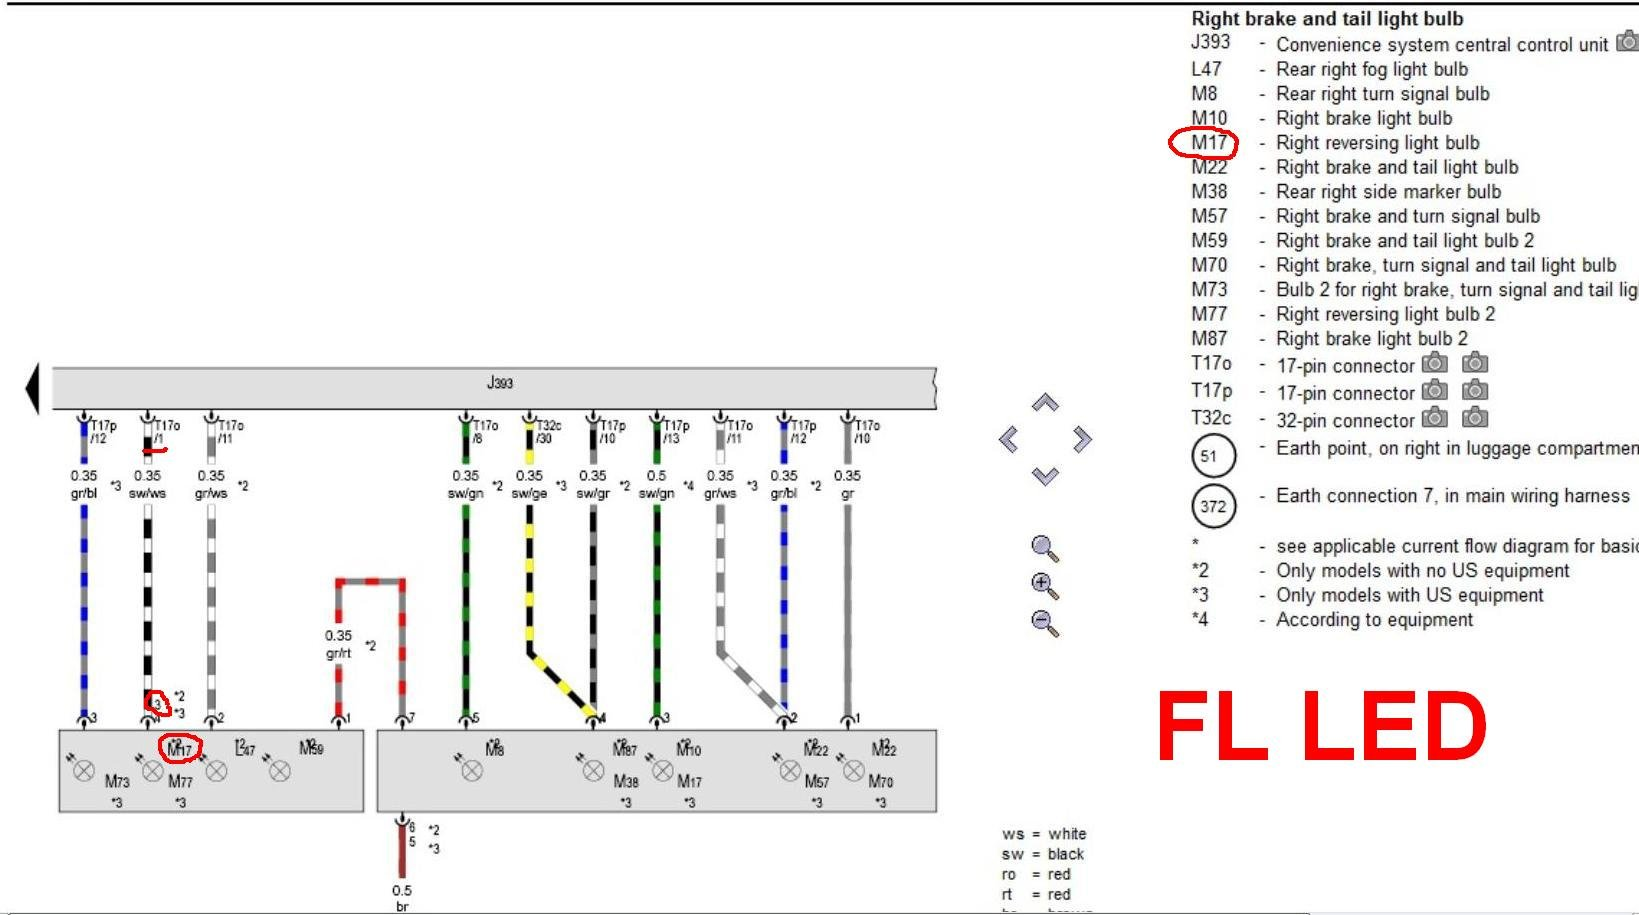 2010 Audi A5 Wiring Diagram - Wiring Diagram Recent week-desk -  week-desk.cosavedereanapoli.it | Audi Coupe Wiring Diagram |  | week-desk.cosavedereanapoli.it